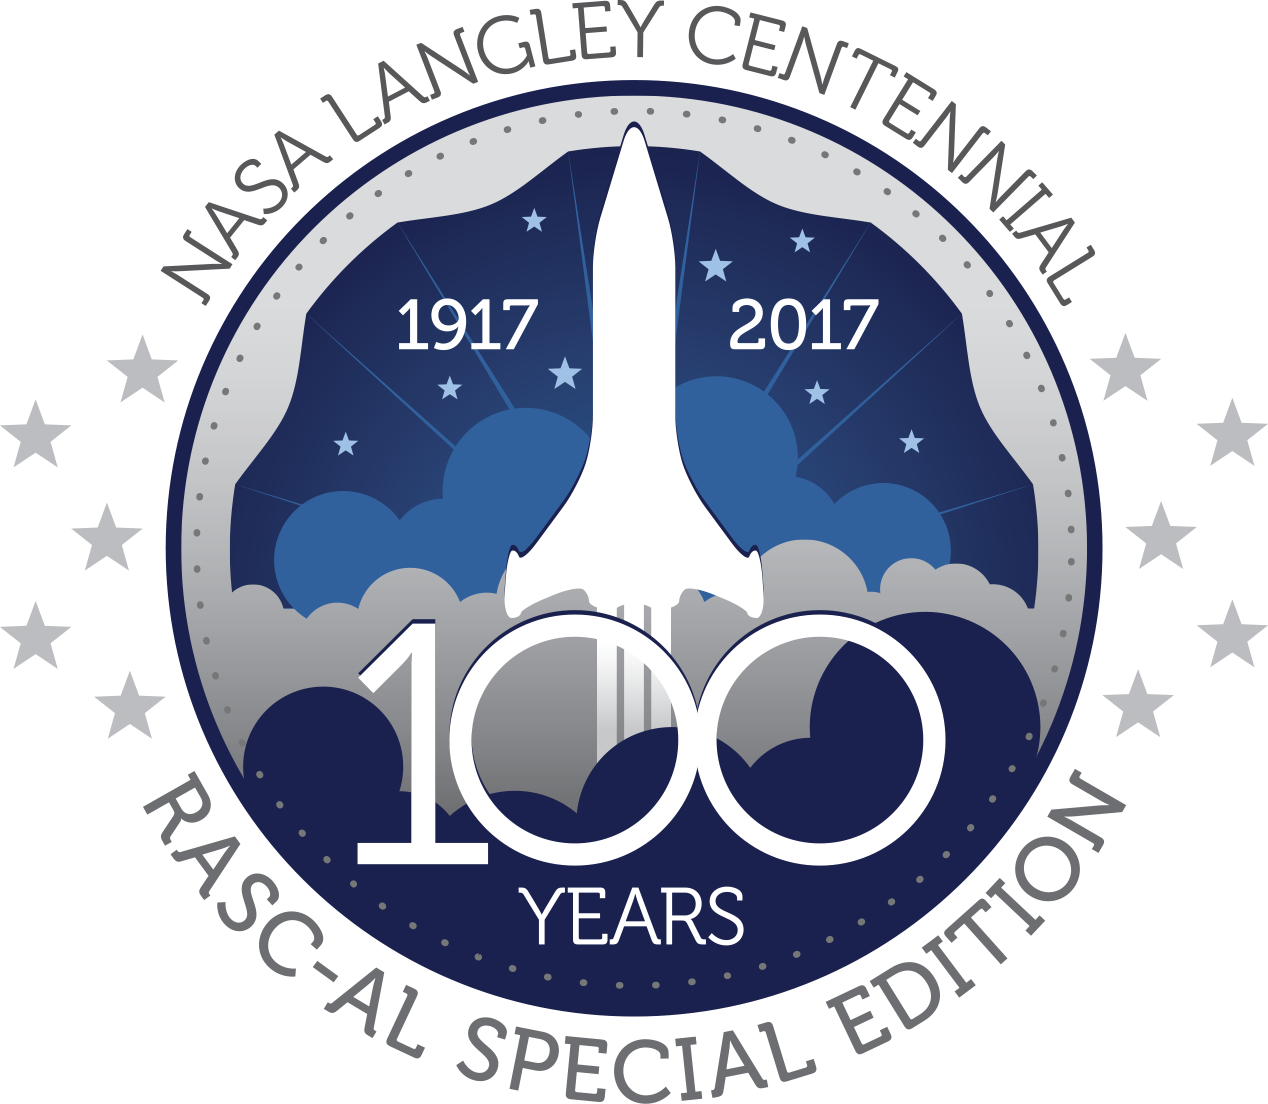 The RASC-AL Special Edition Mars Ice Challenge